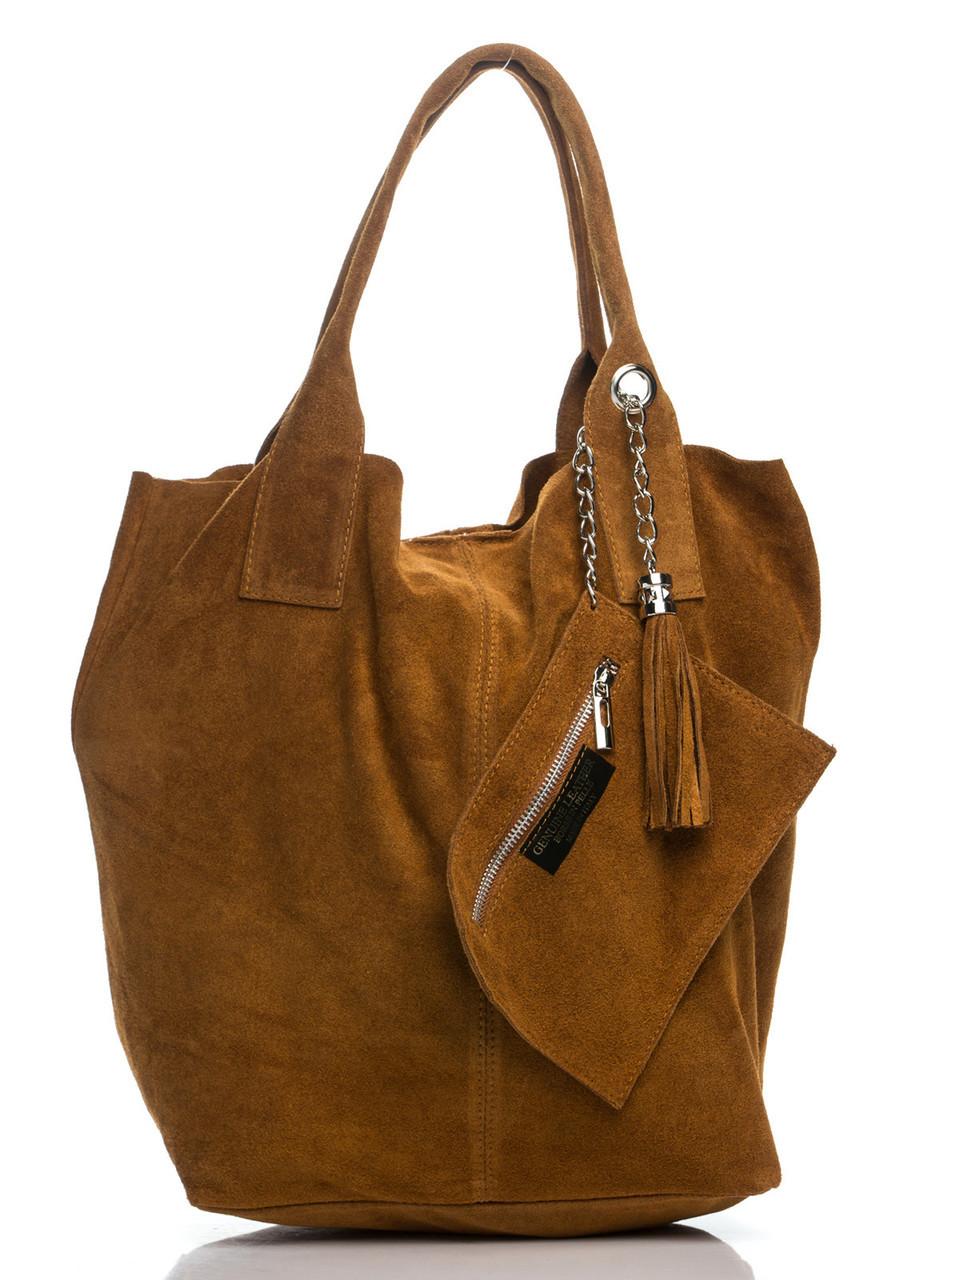 Шкіряна сумка хакі типу шопер ARIANNA diva's Bag коньячна 27 см х 36 см х 18 см